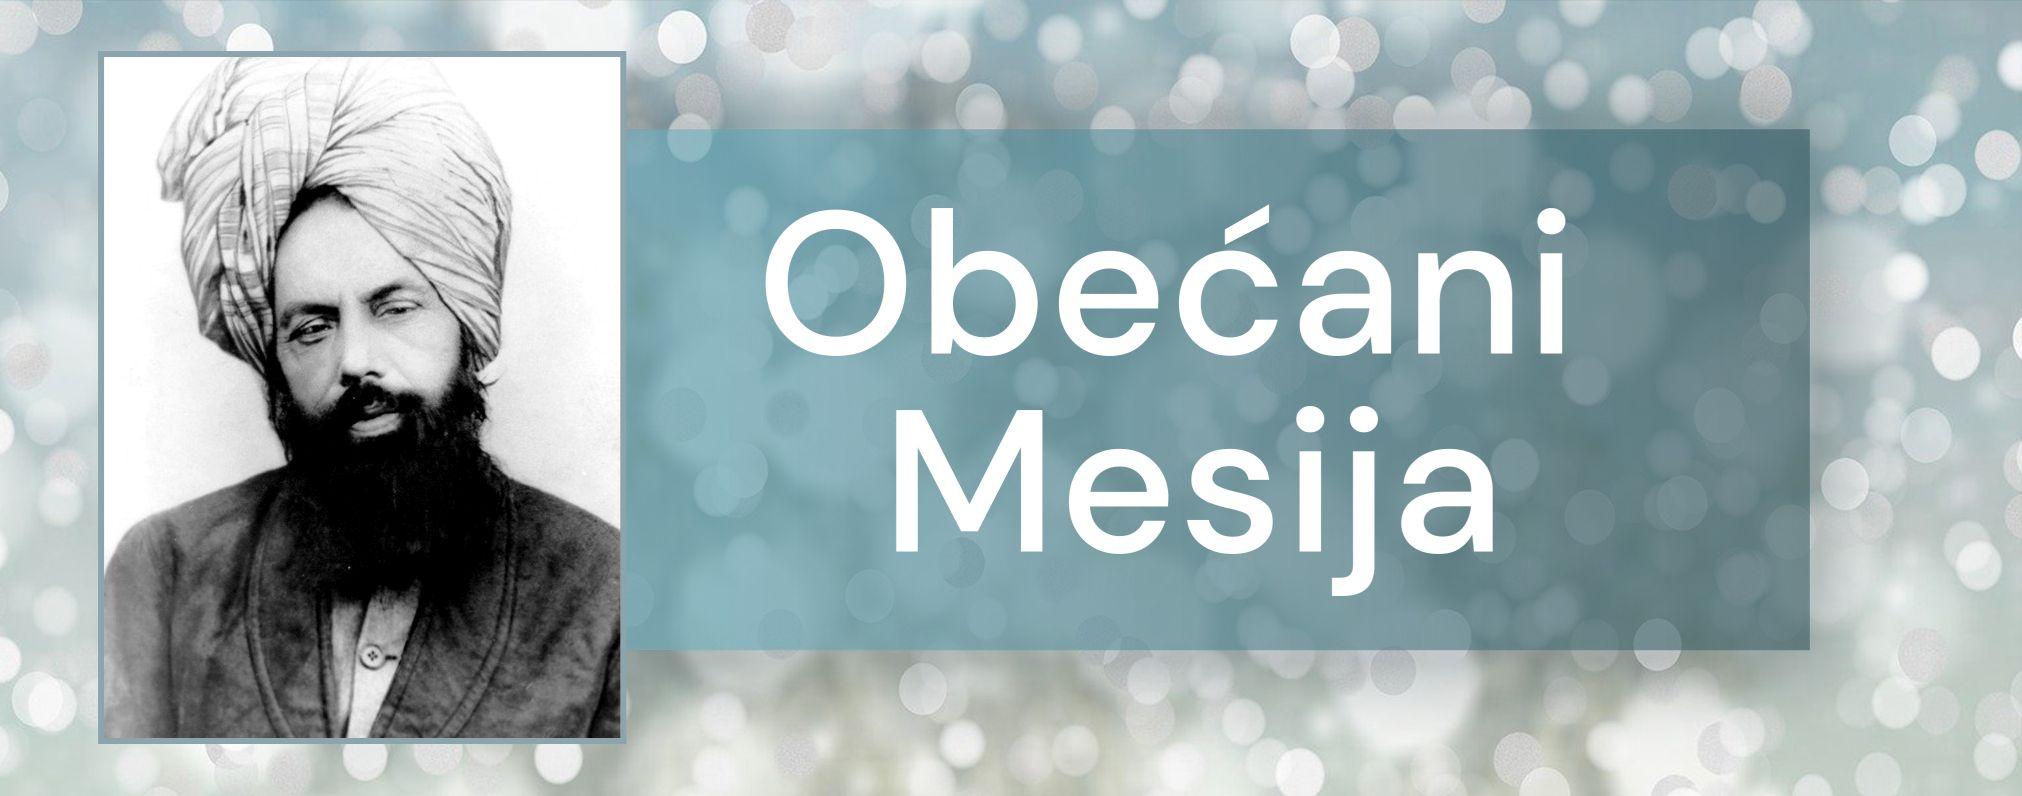 Hazreti Mirza Ghulam Ahmad Obećani Mesija